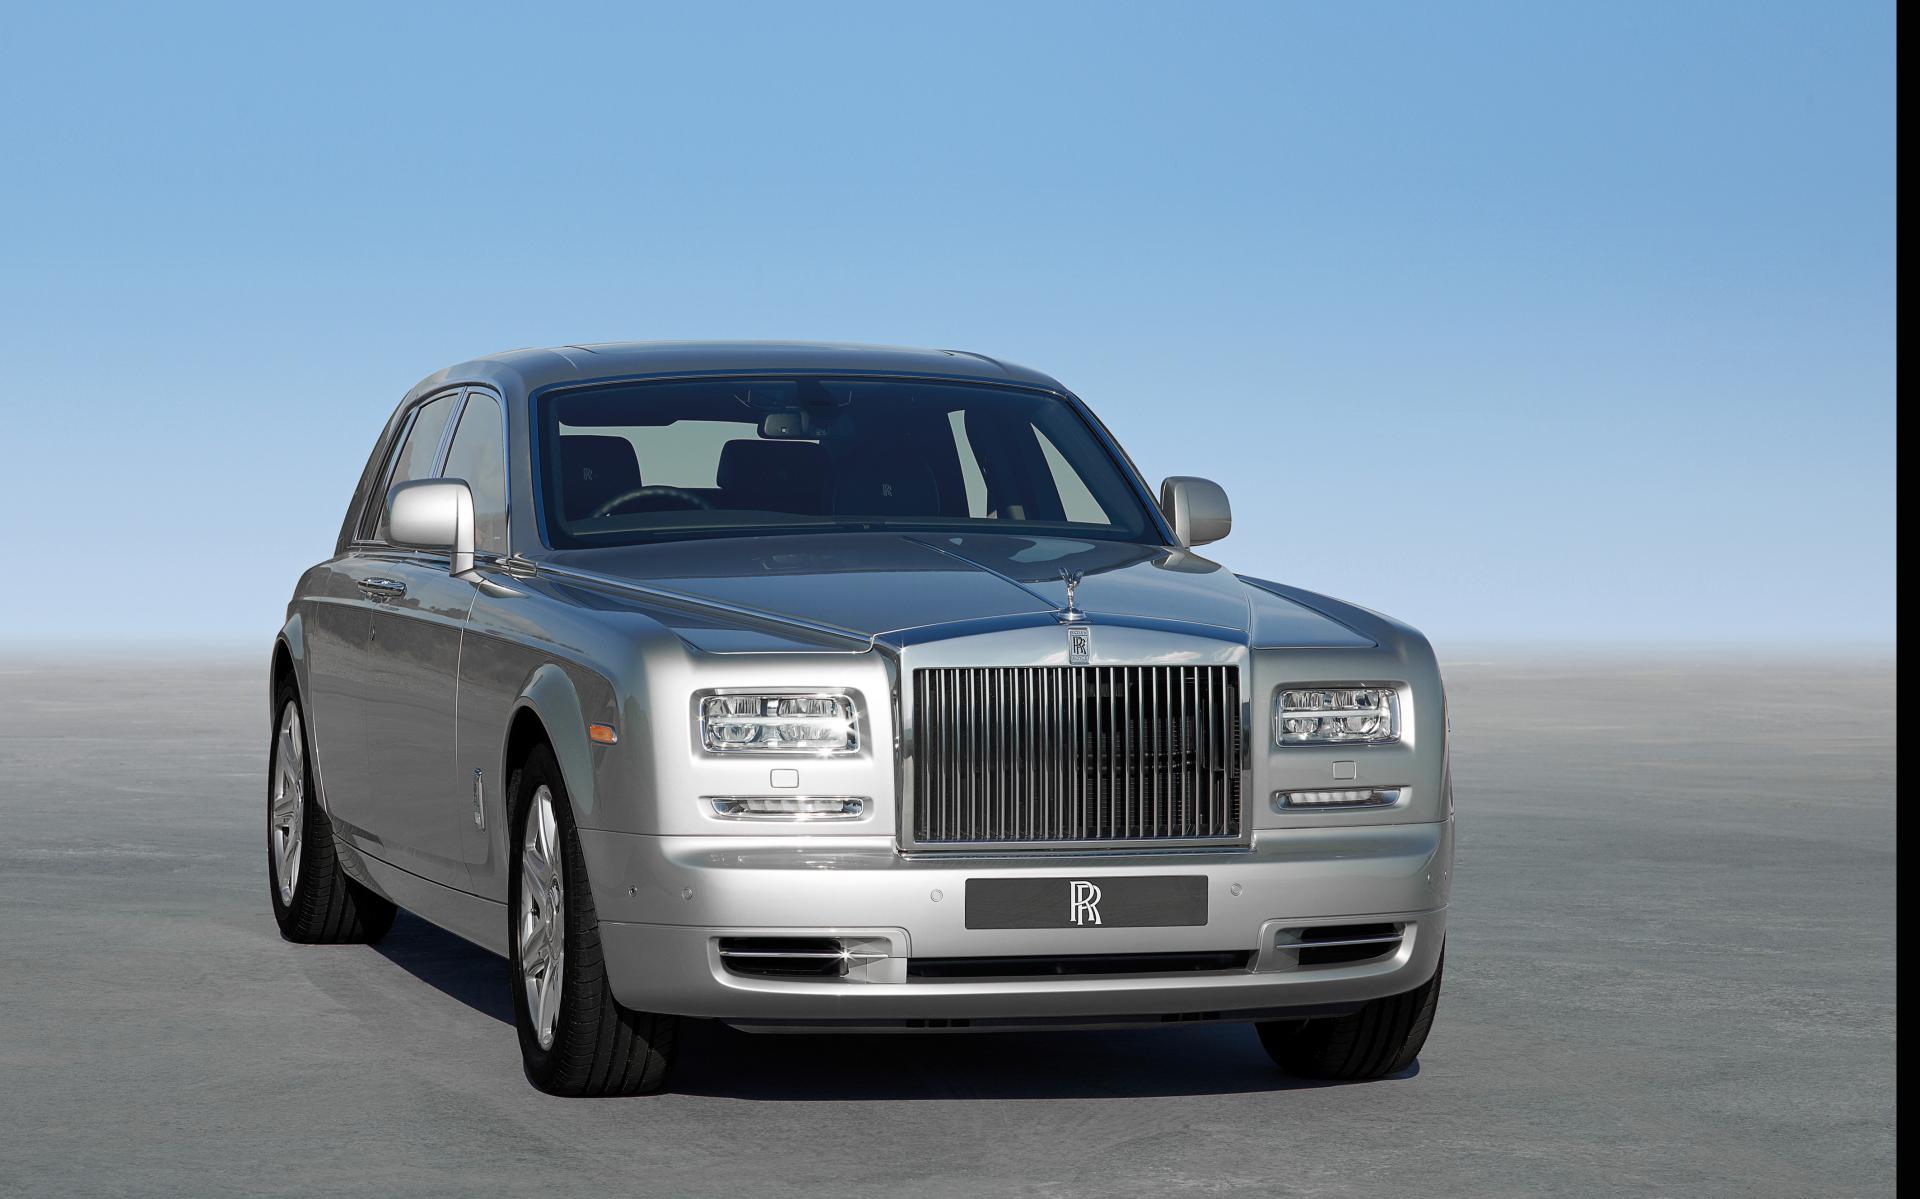 2014 Rolls-Royce Phantom News and Information